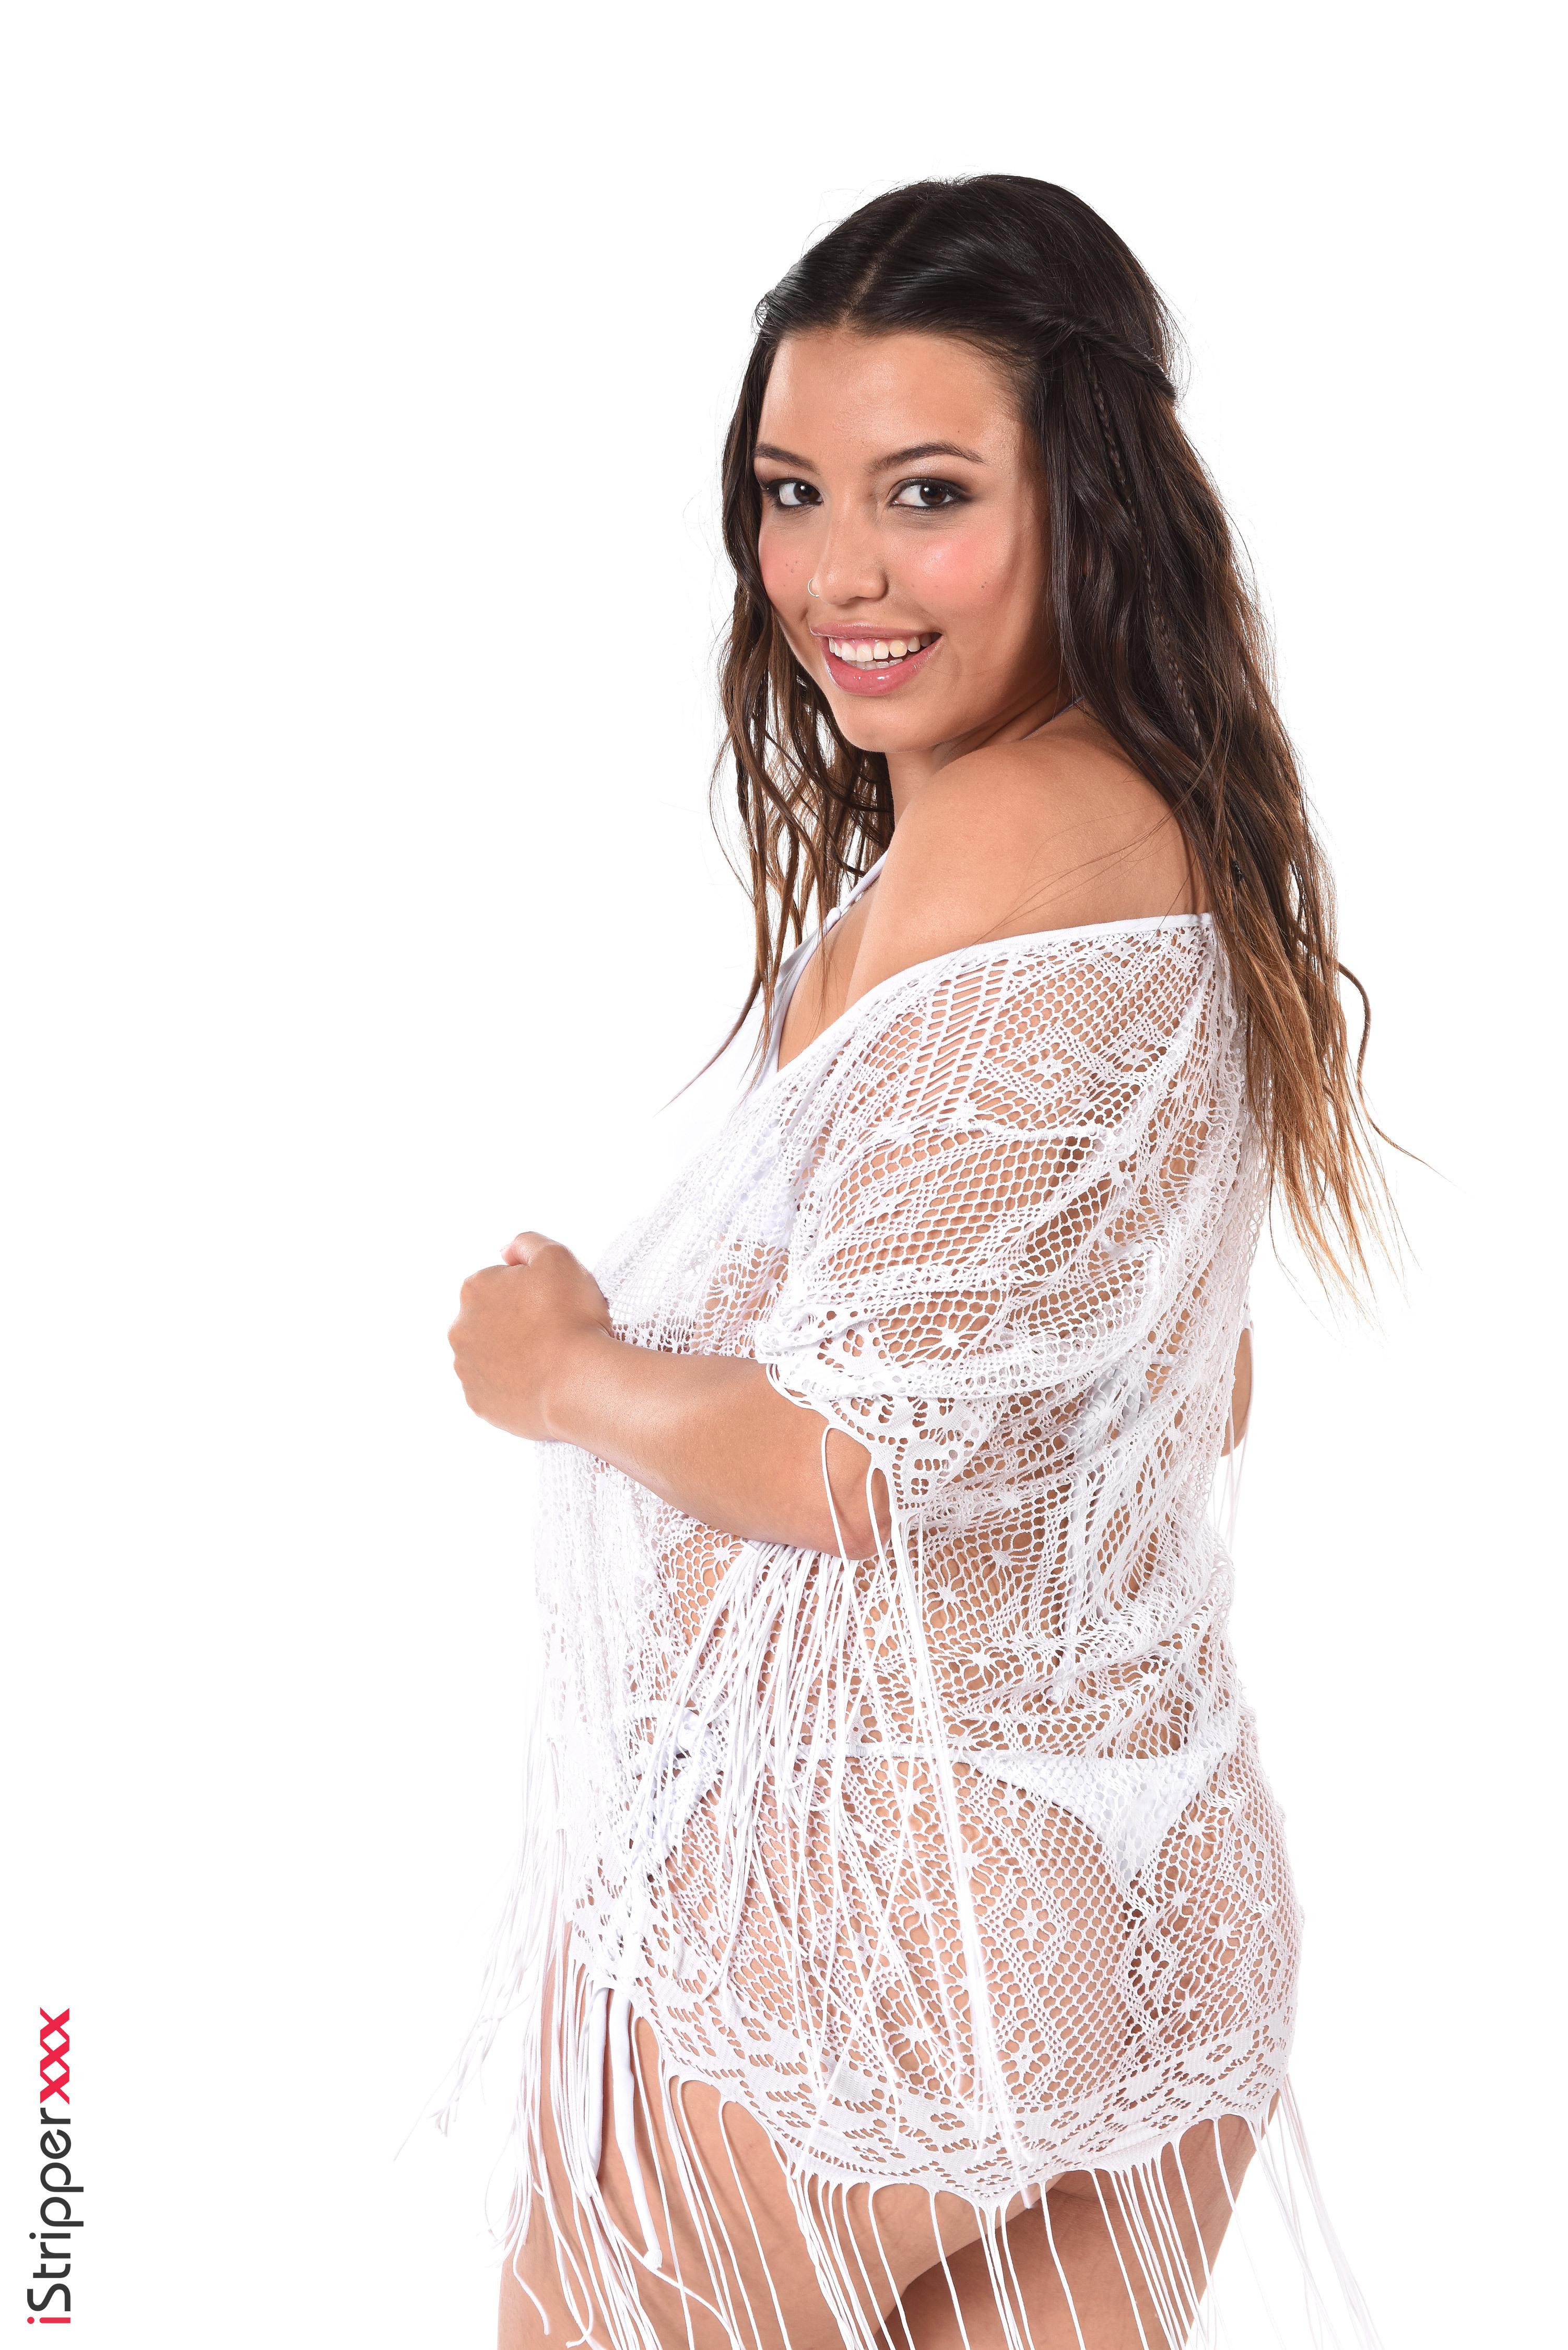 lana tailor nude wallpaper